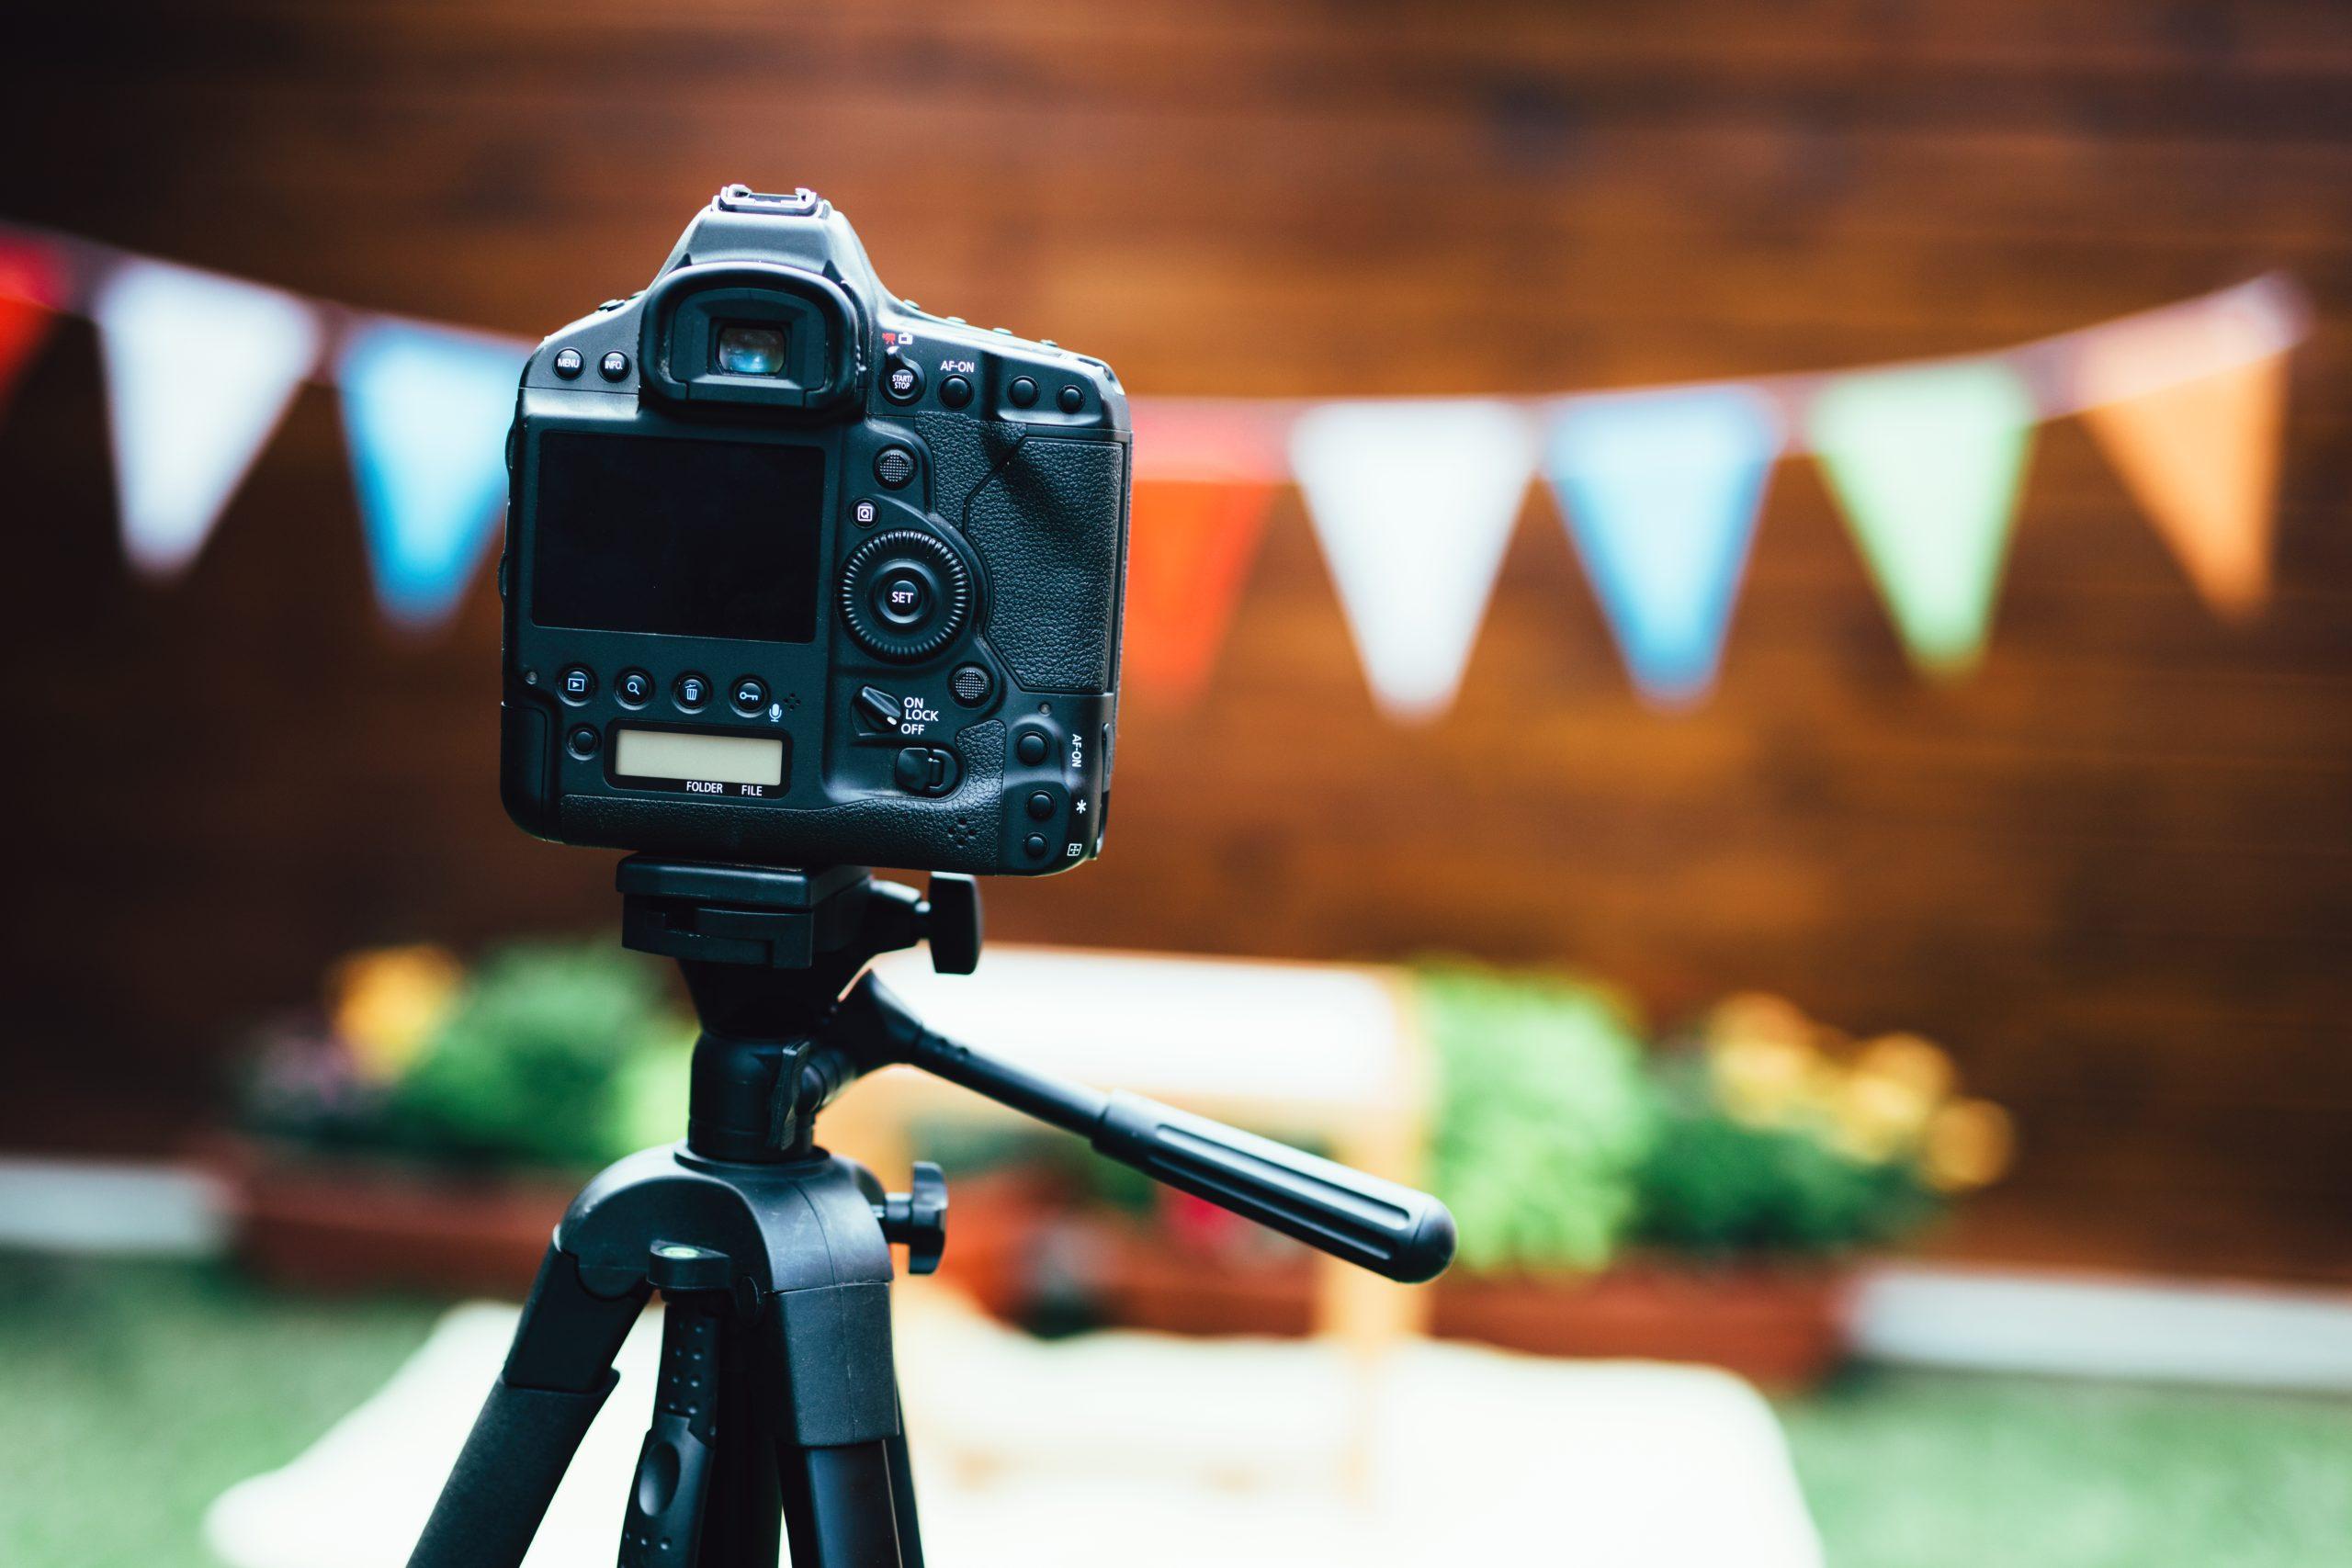 Le meilleur appareil photo hybride ou reflex